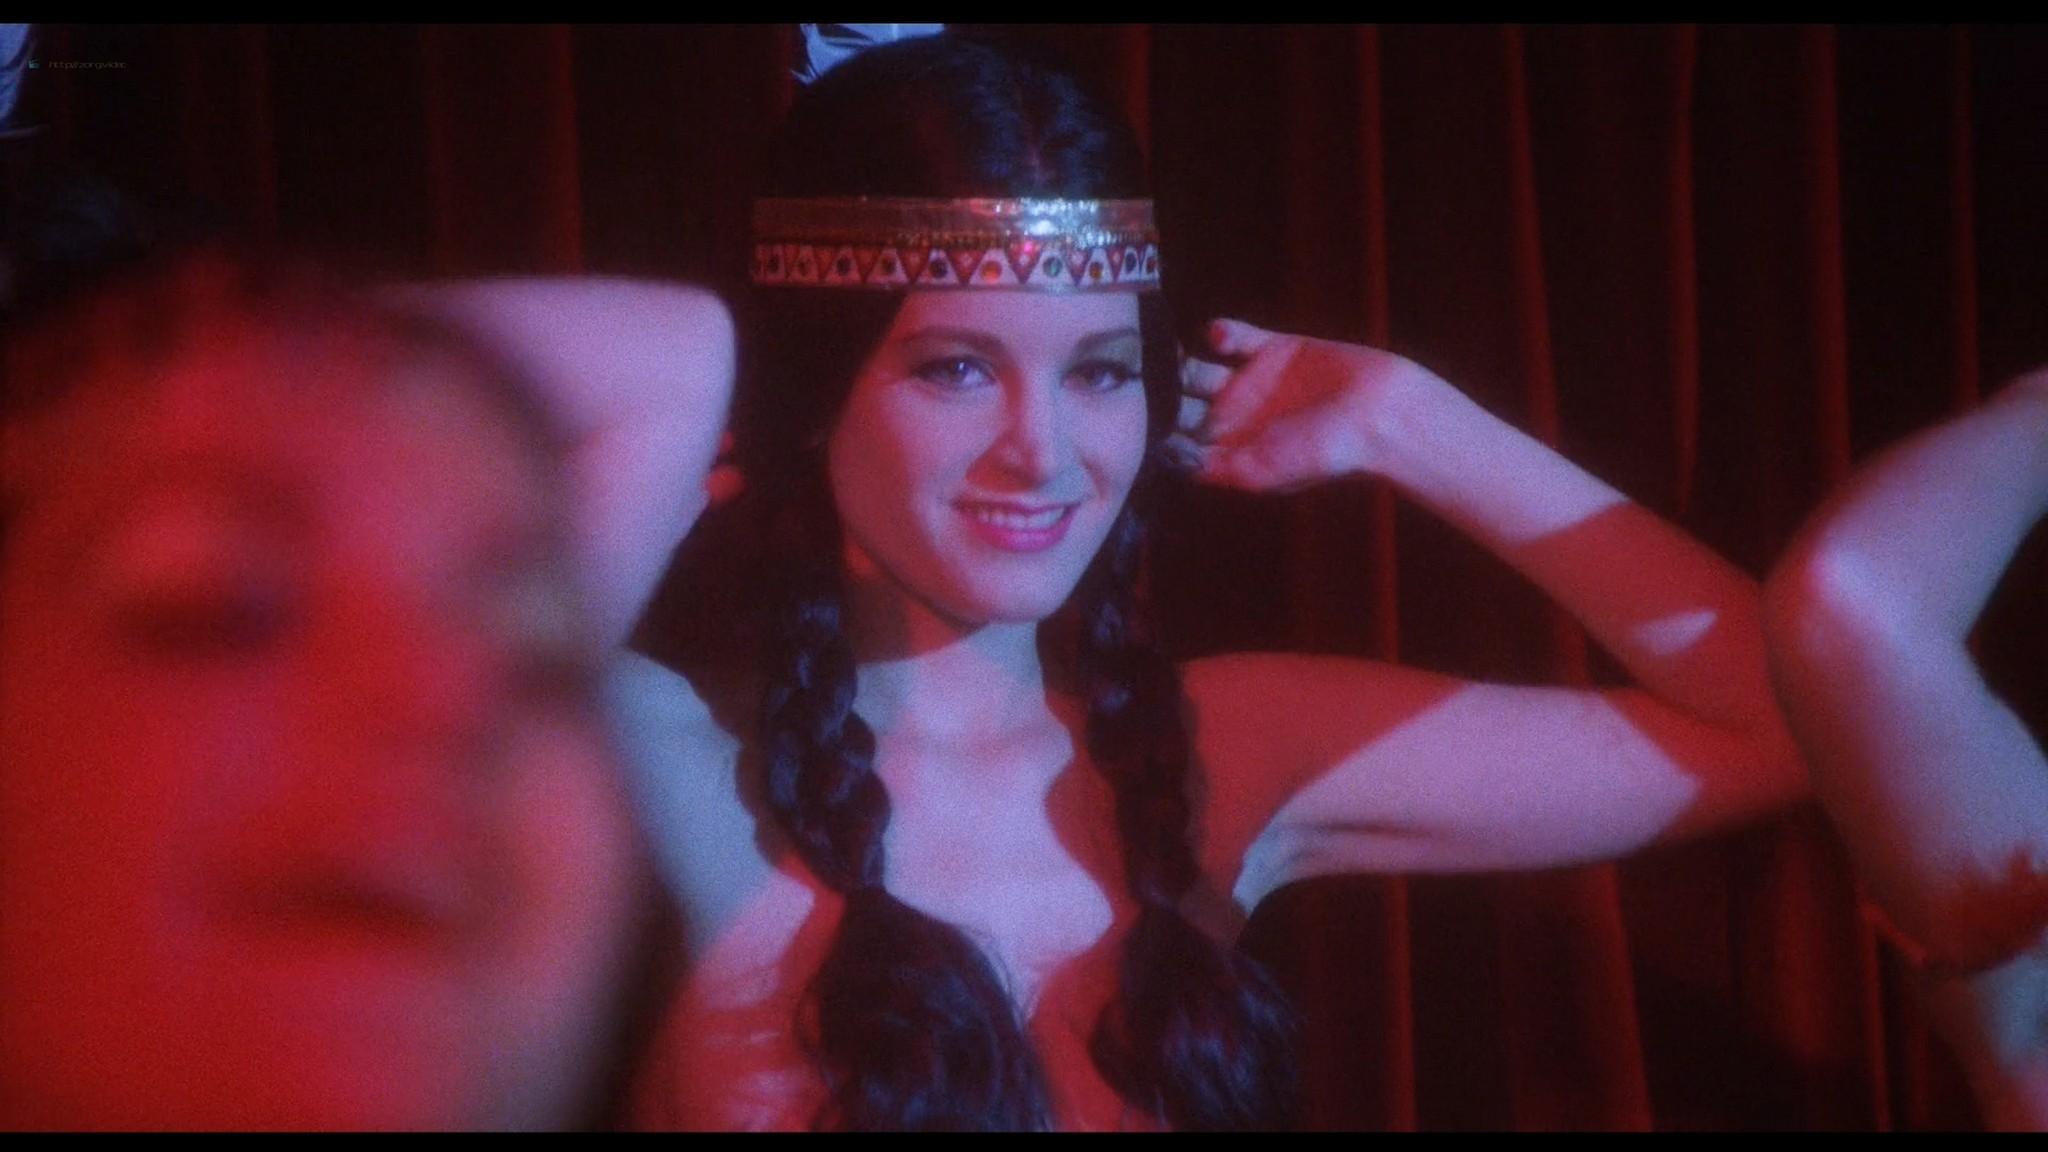 Bridget Fonda nude butt boobs Britt Ekland nude Joanne Whalley hot - Scandal (1989) HD 1080p BluRay (14)